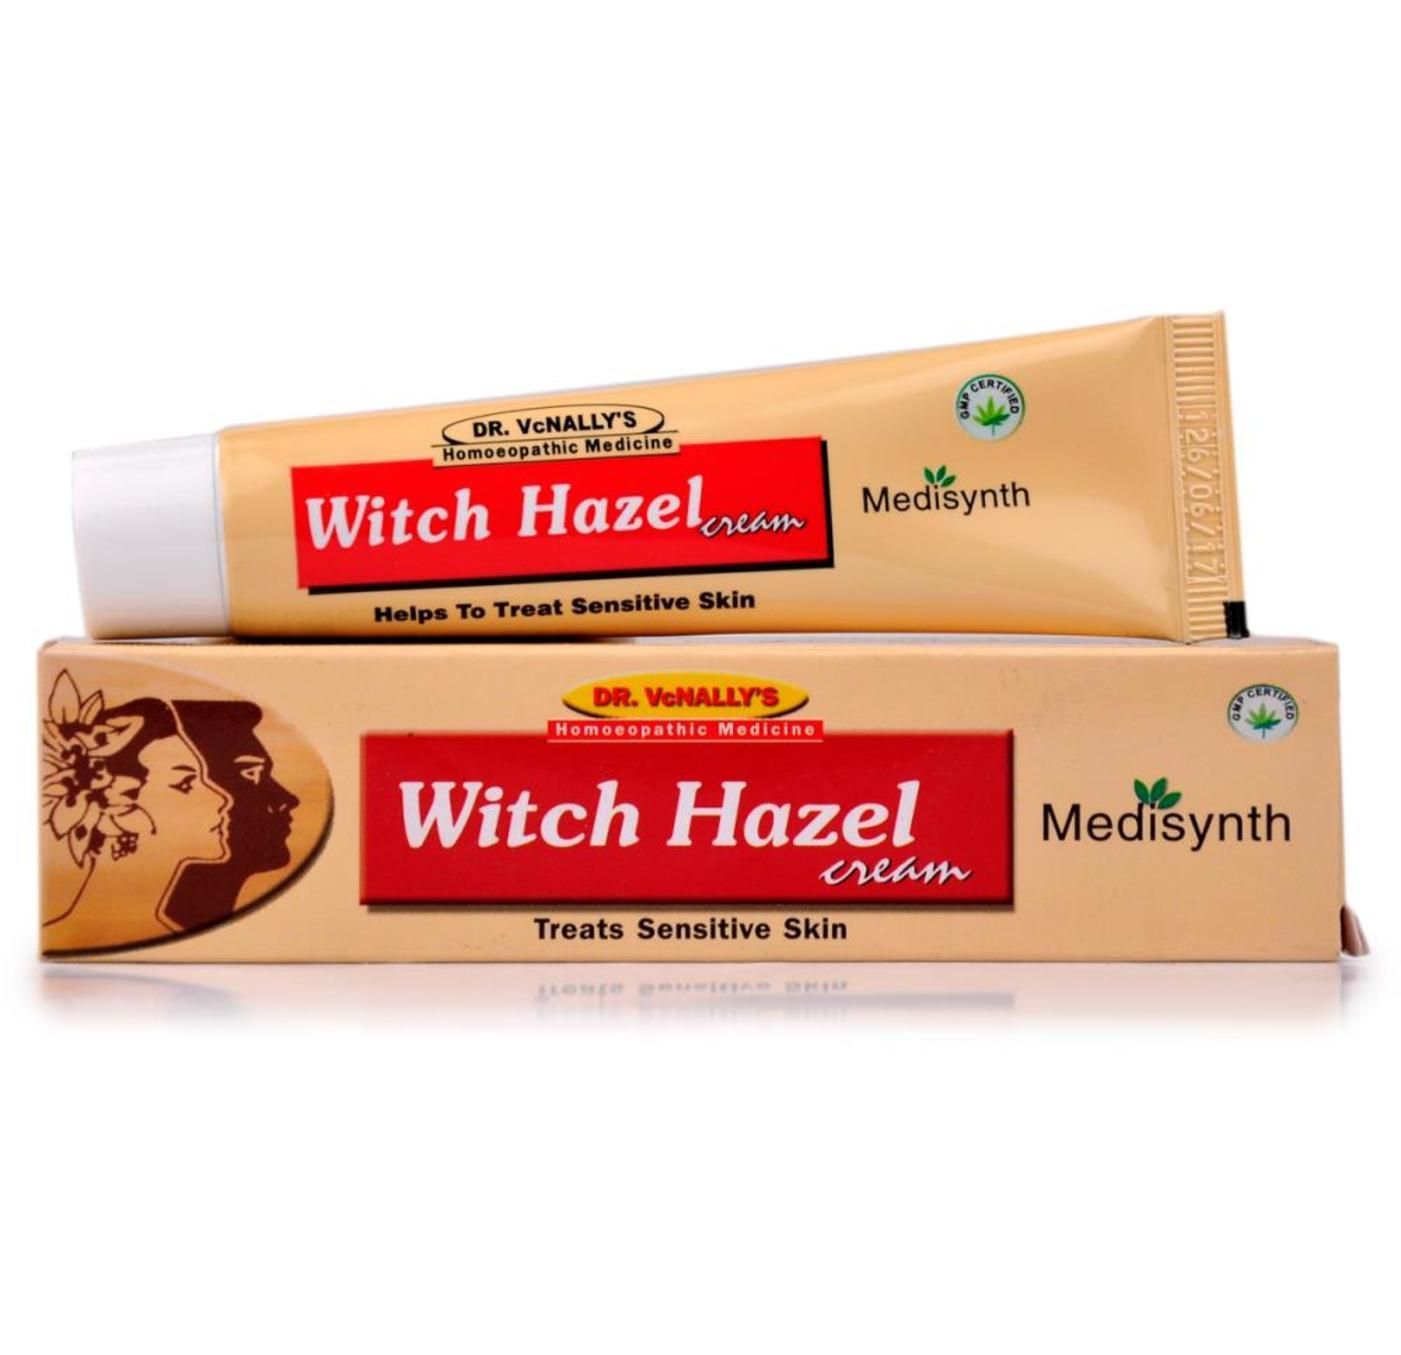 Medisynth Witch Hazel Cream Homeopathic Medicine style=